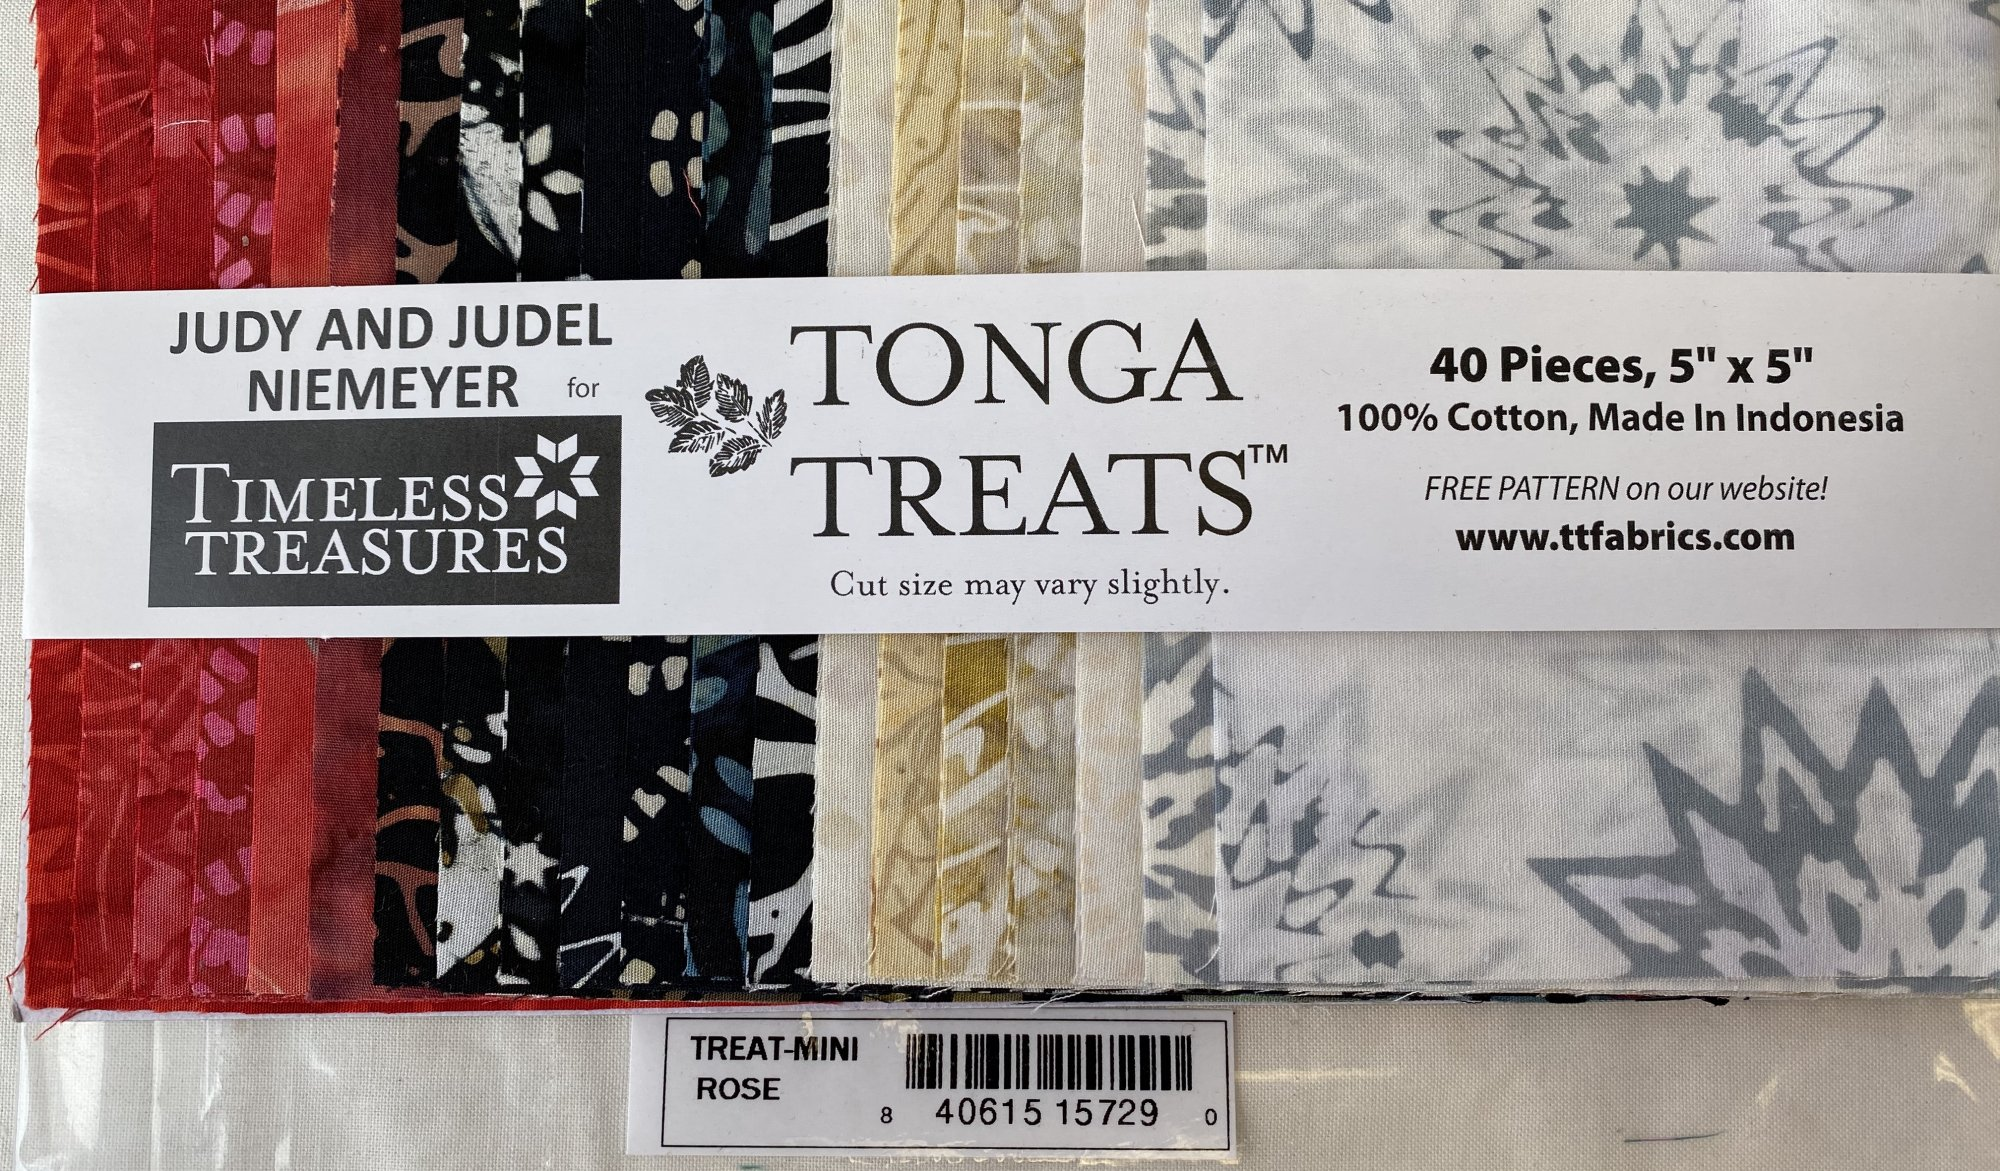 Rose Tonga Treats Charm Pack